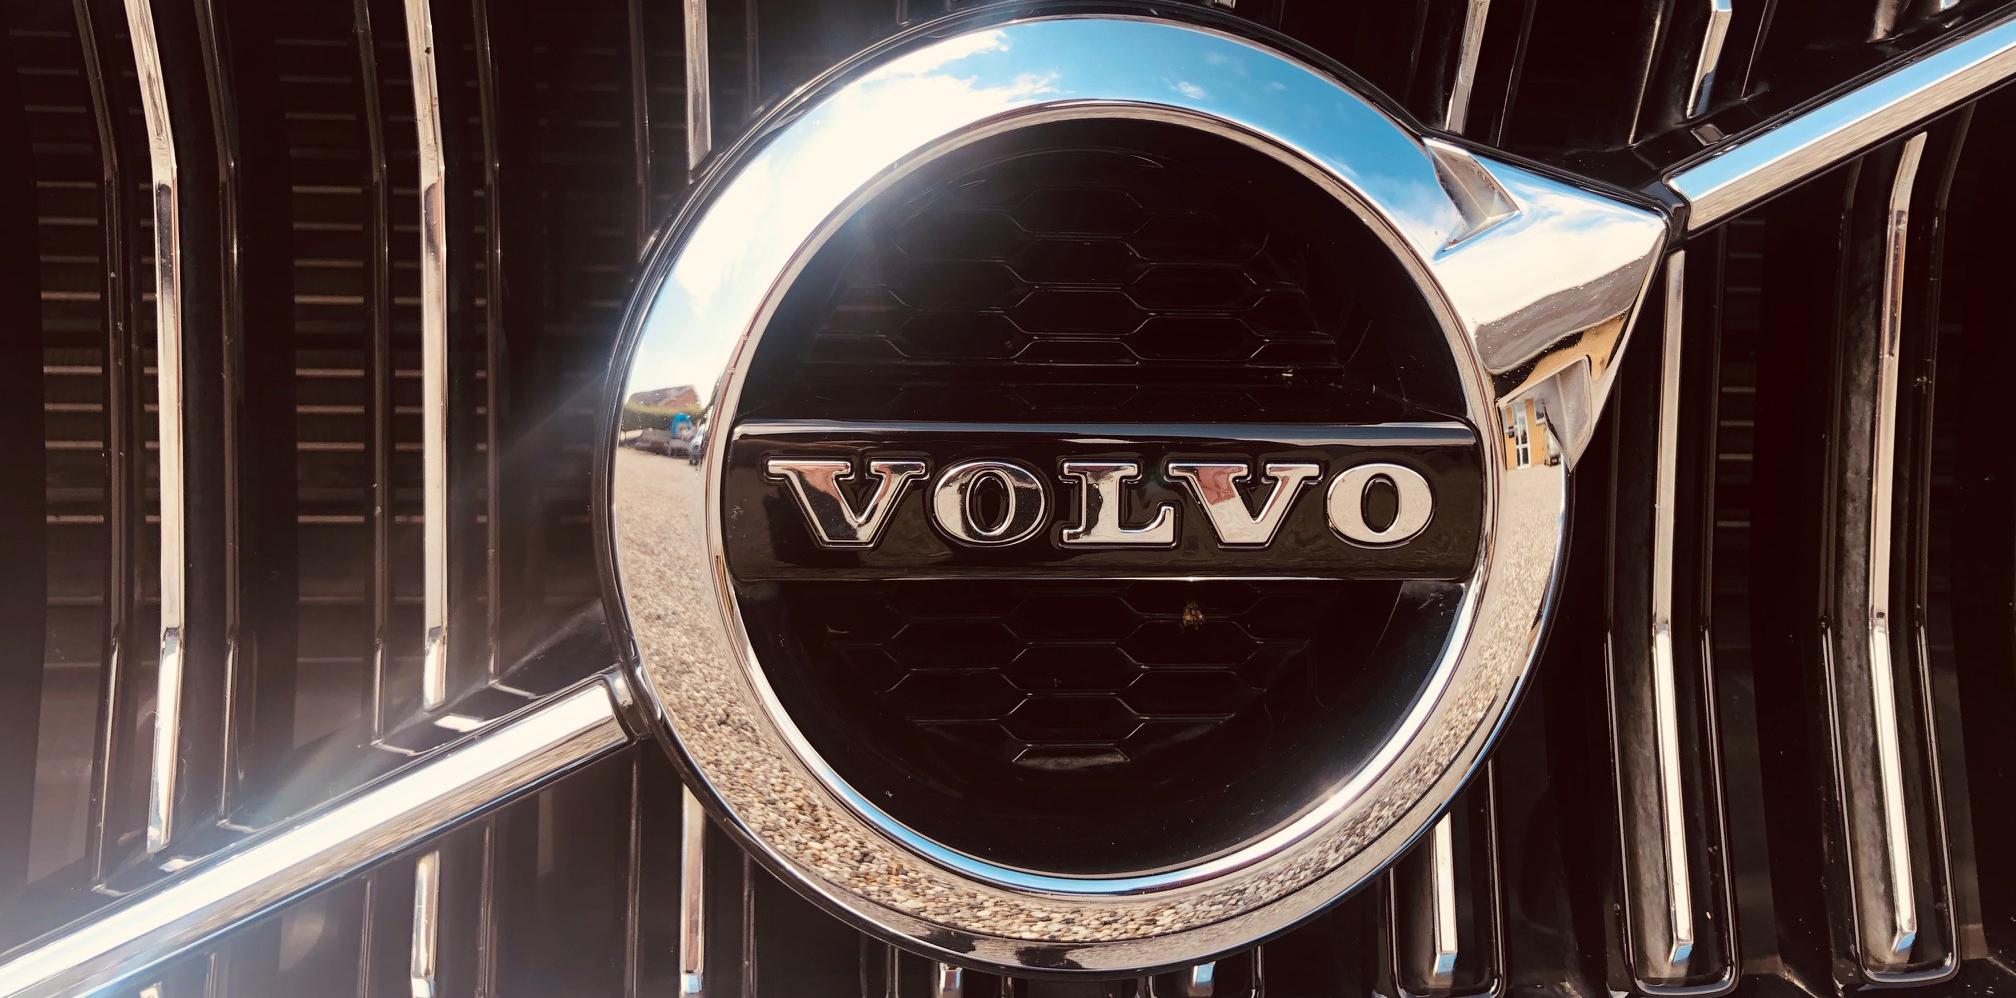 Volvo V60 D4 Ditec Ceramic Ultra behandlet hos Bilpleje Hadsten